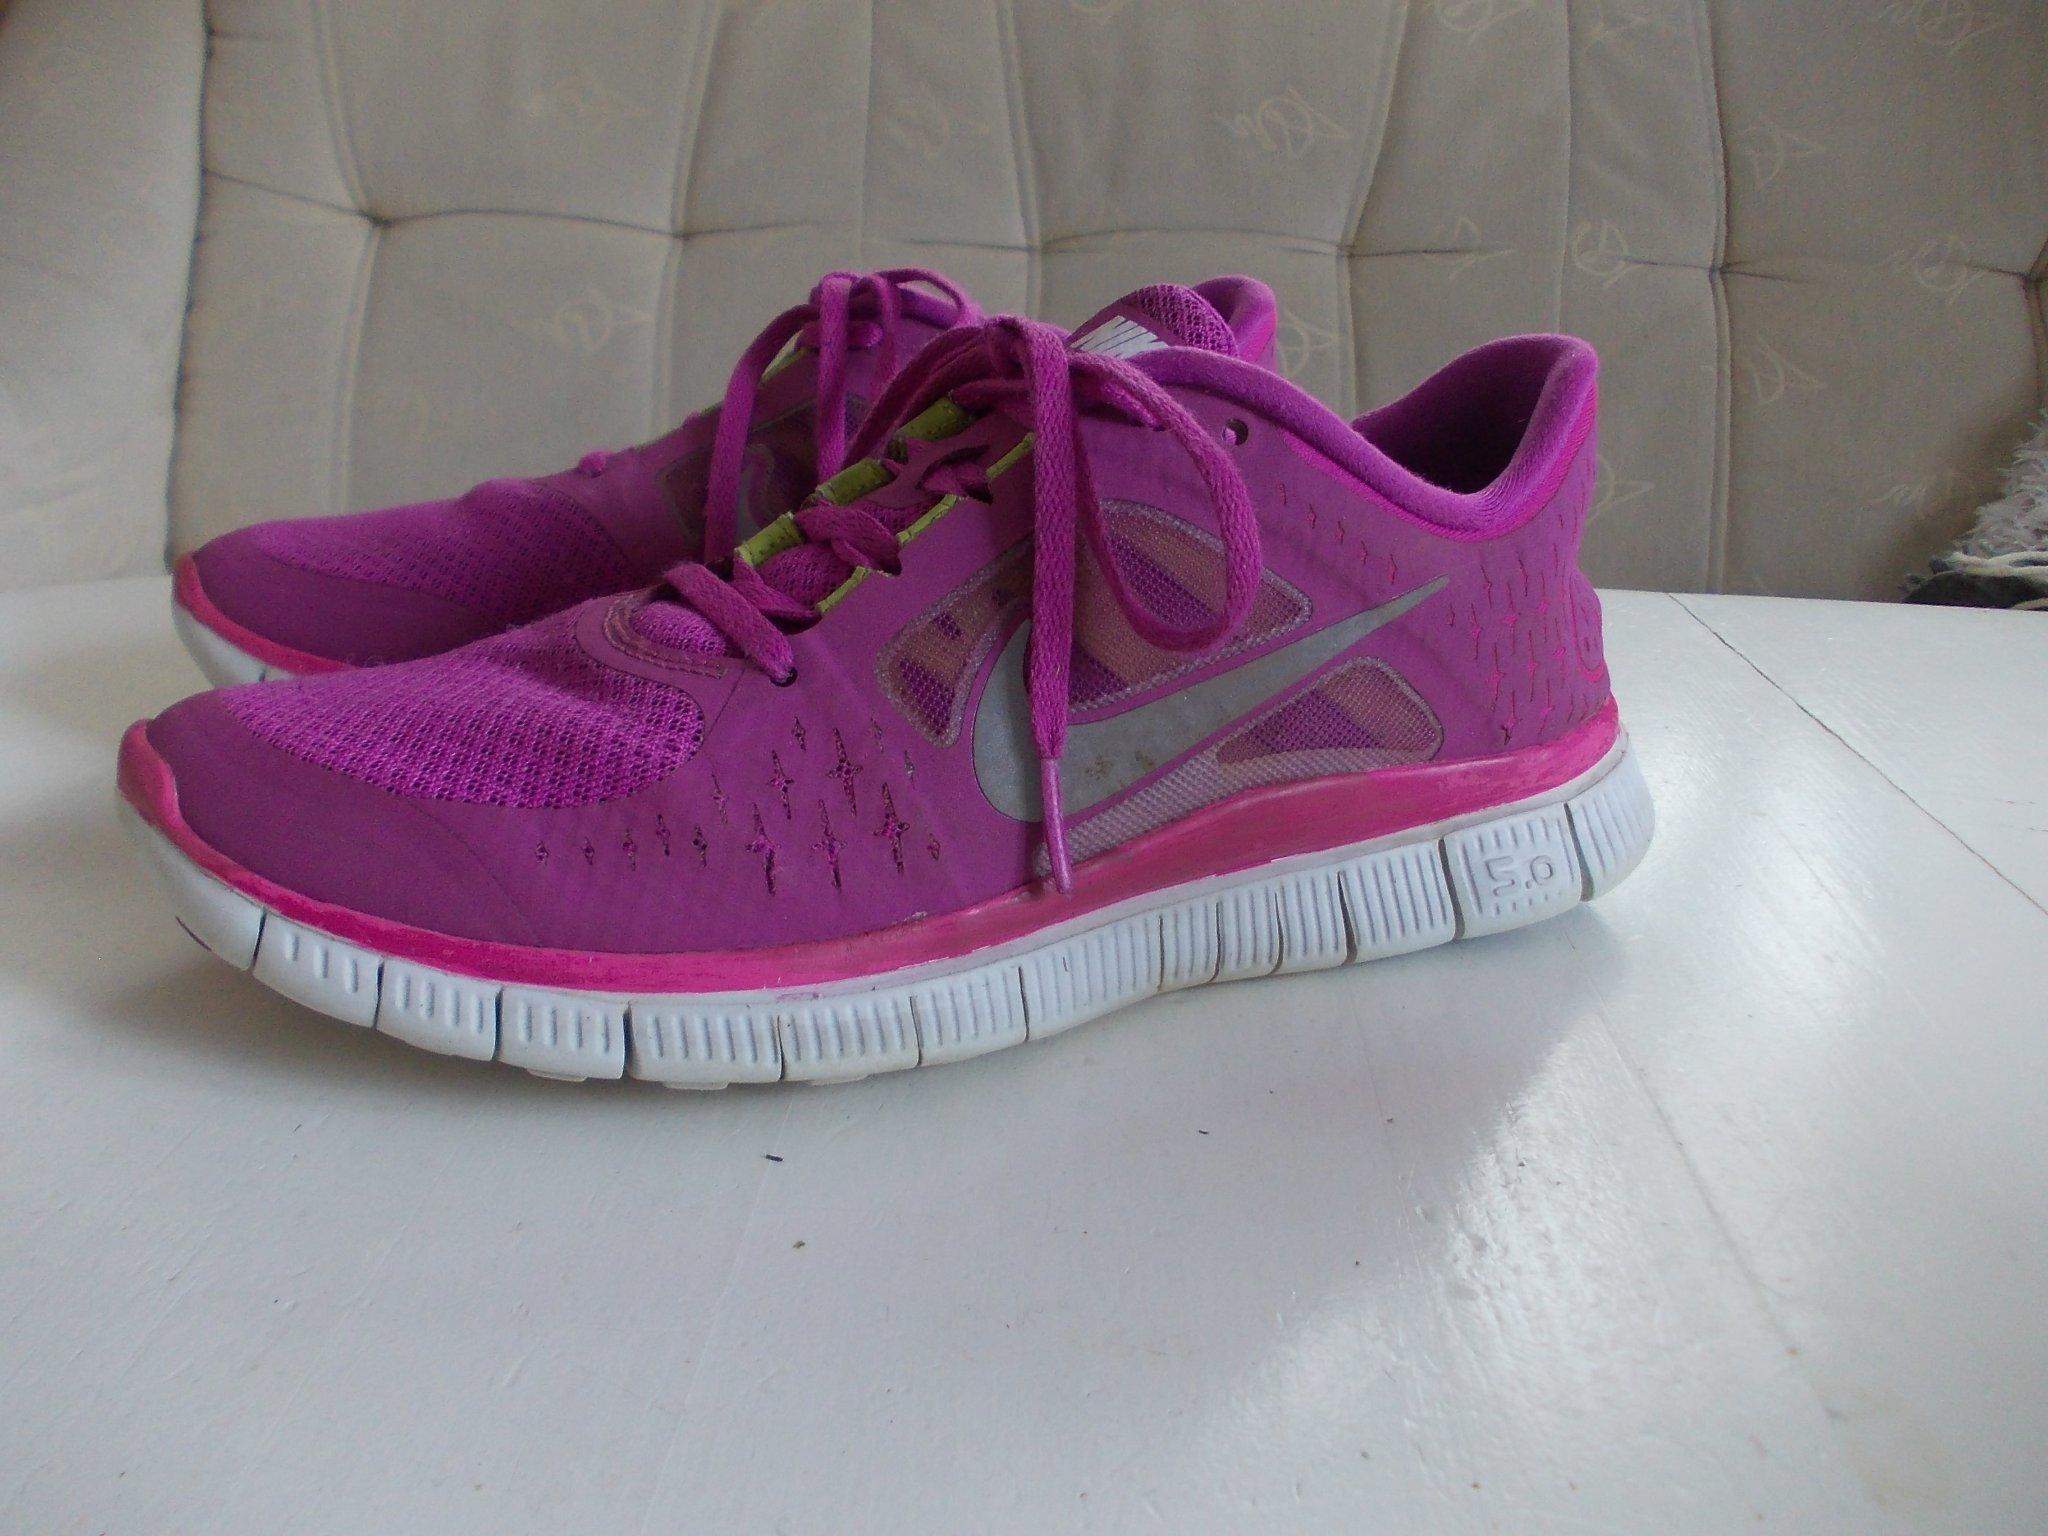 1dae8e7fa57 NIKE FREE Run sport skor sneakers stl 40 ( 25,5 ) (346085243) ᐈ Köp ...